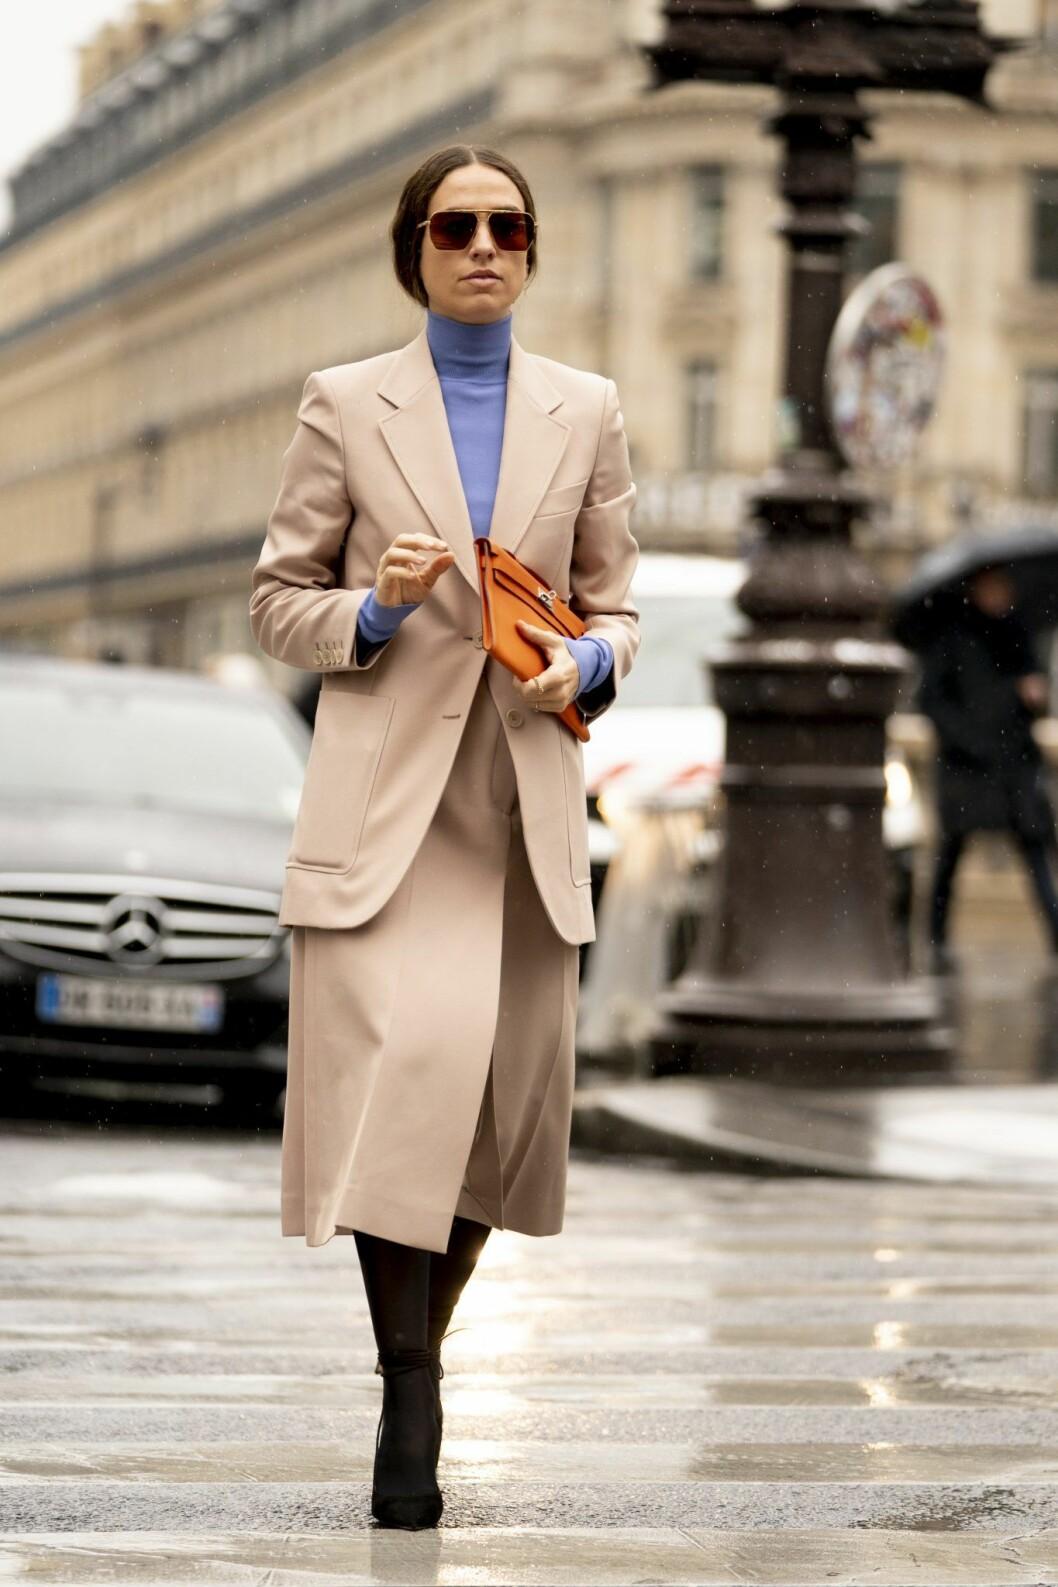 Lila polotröja Streetstyle Paris Fashion Week AW20.